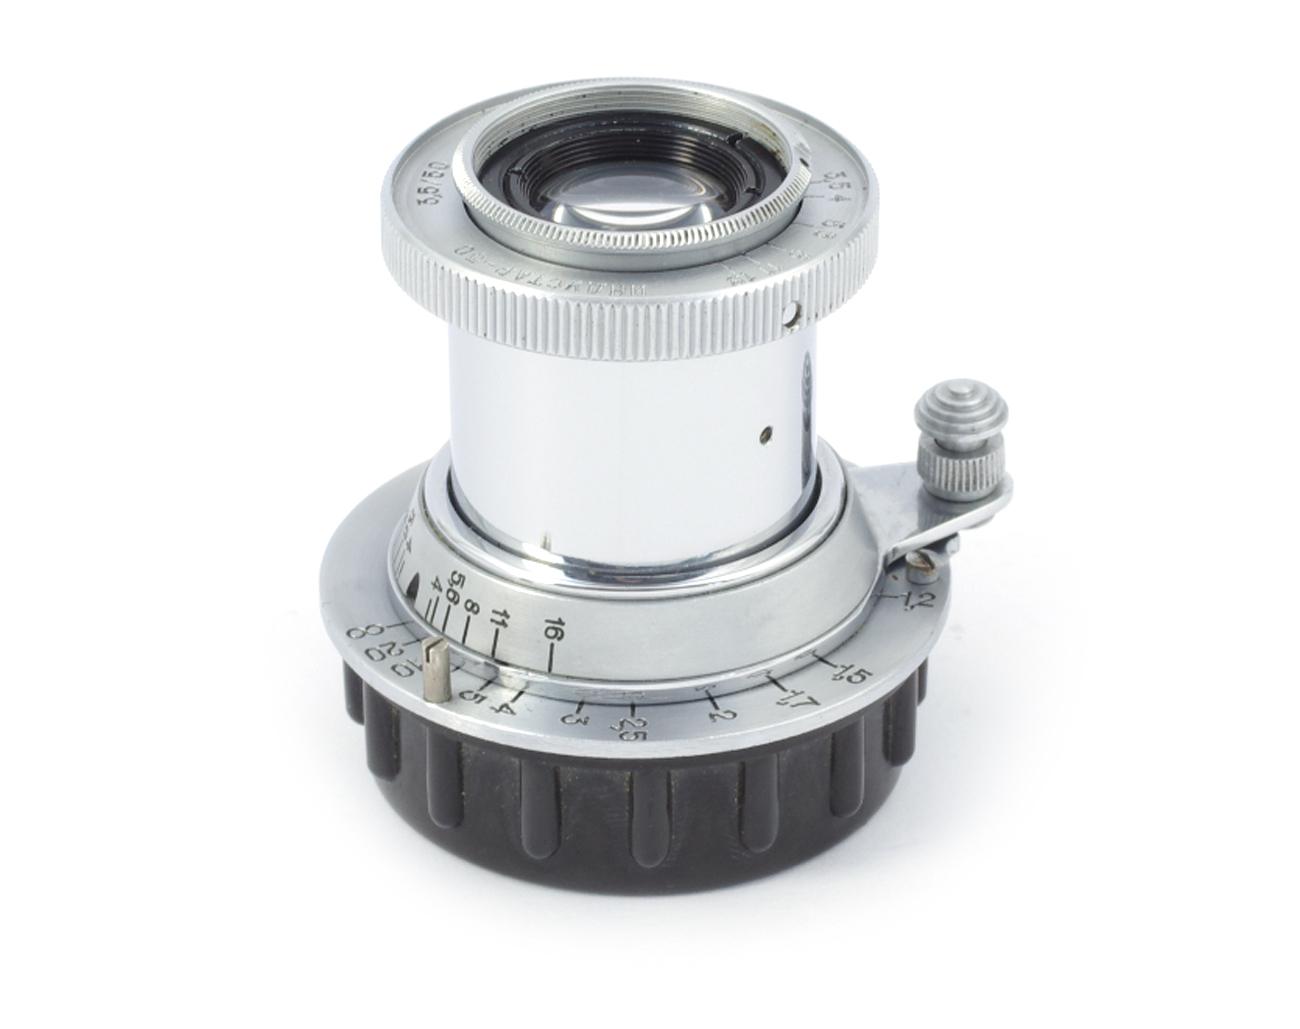 Industar-50-3-5-50-mm-Russian-Lens-for-M39-Zorki-FED